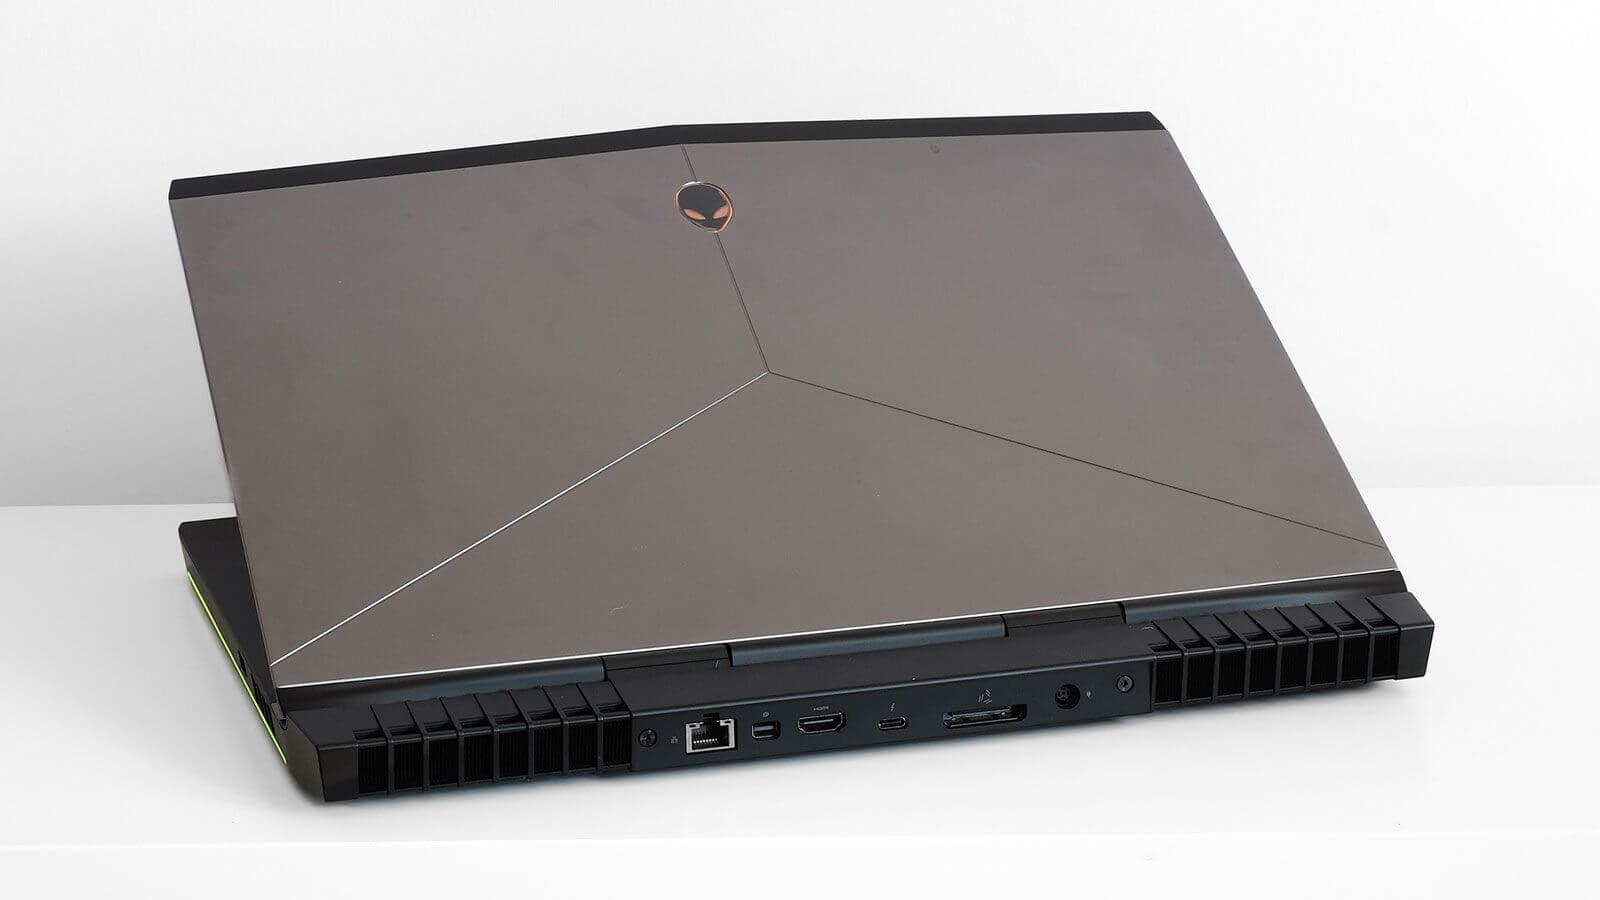 Alienware 15 R3 02 - Review: Alienware 15 R3, o notebook gamer dos sonhos